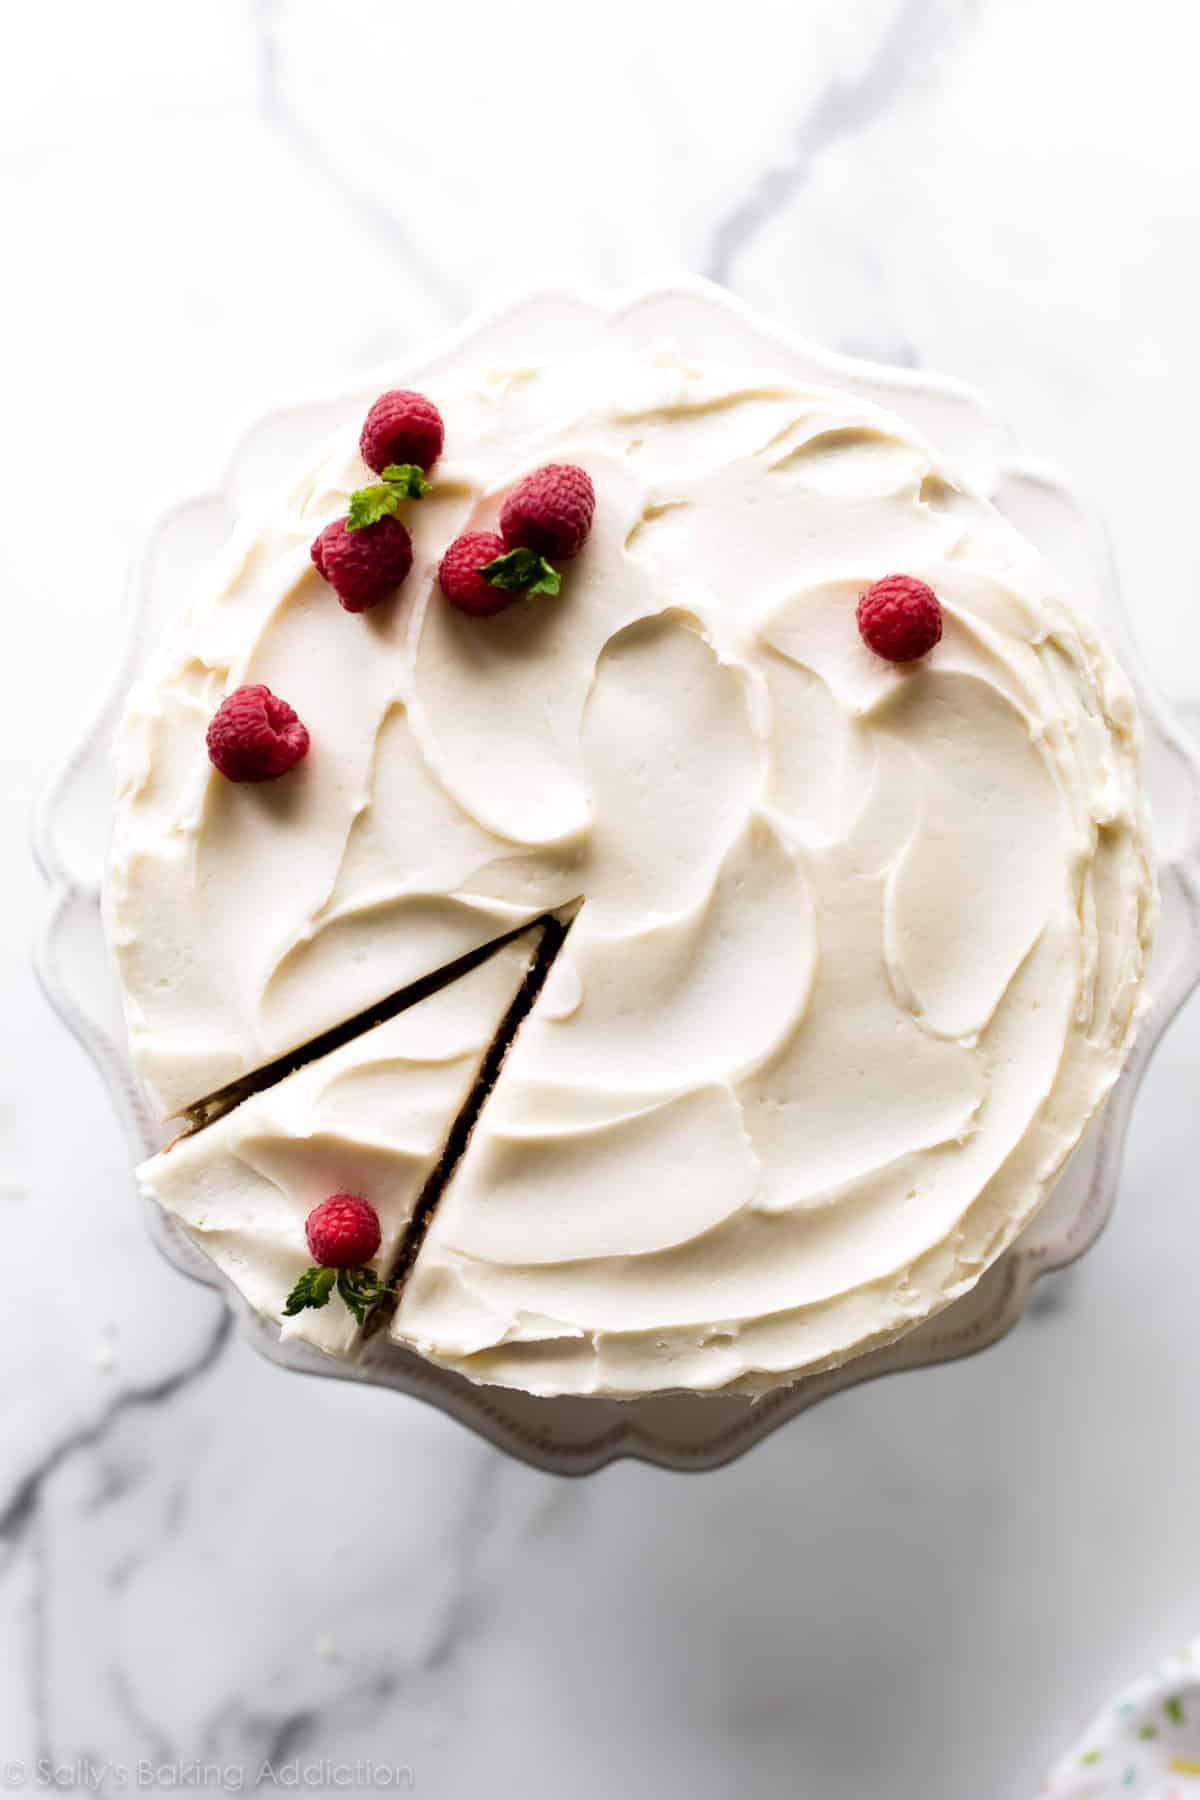 Top of a vanilla cake